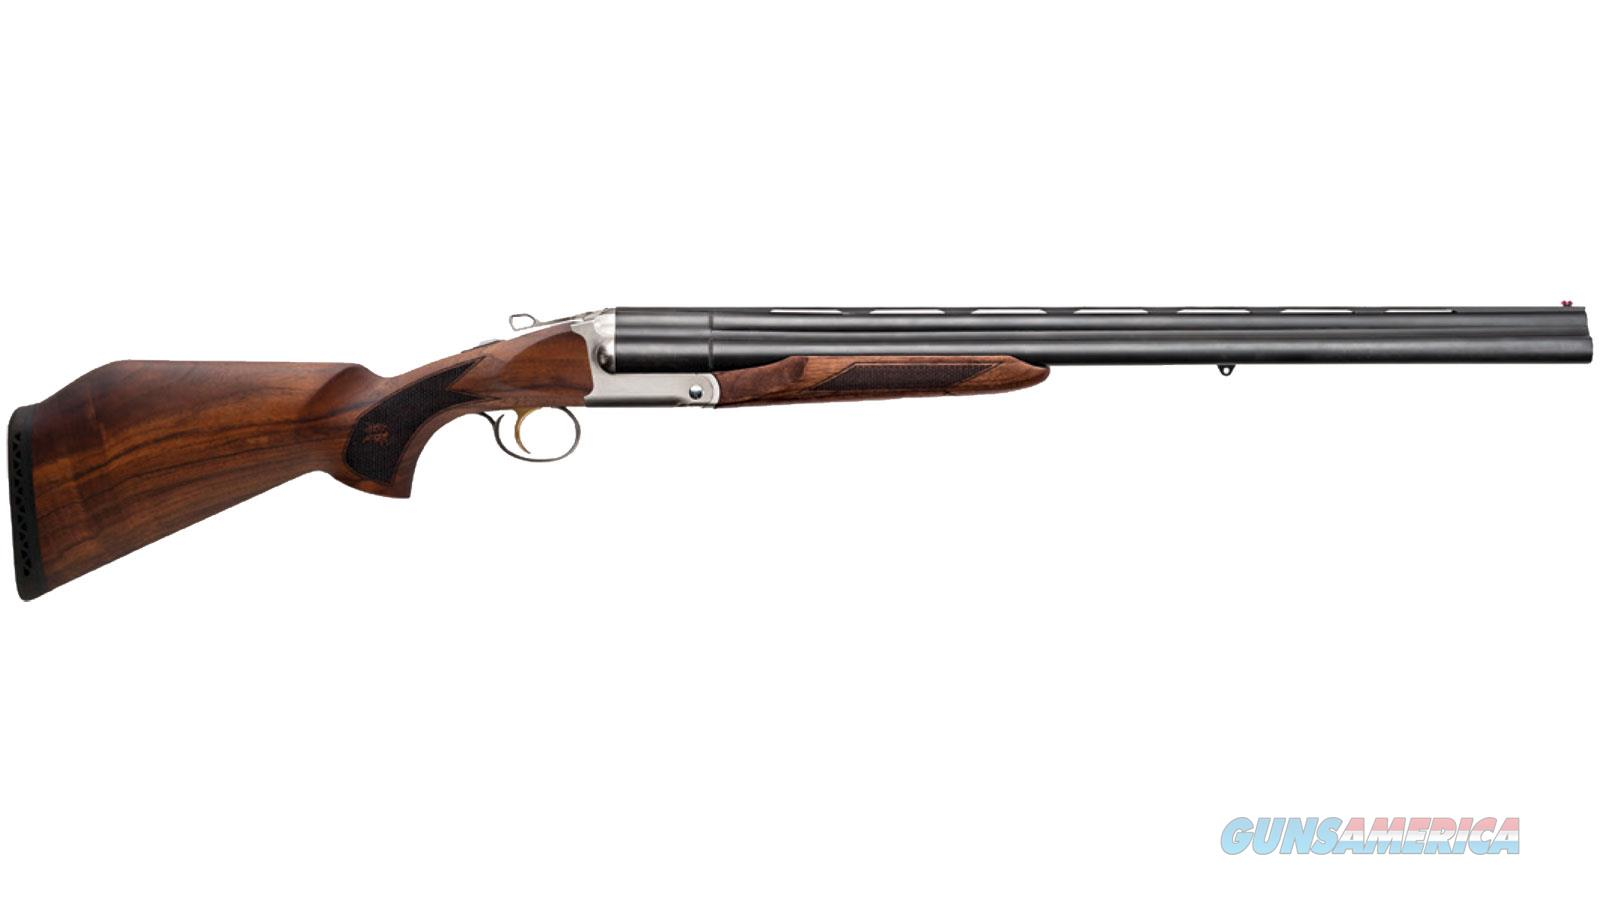 Chiappa Firearmsmks Trpl Crwn Comp 12G 930.079  Guns > Rifles > C Misc Rifles